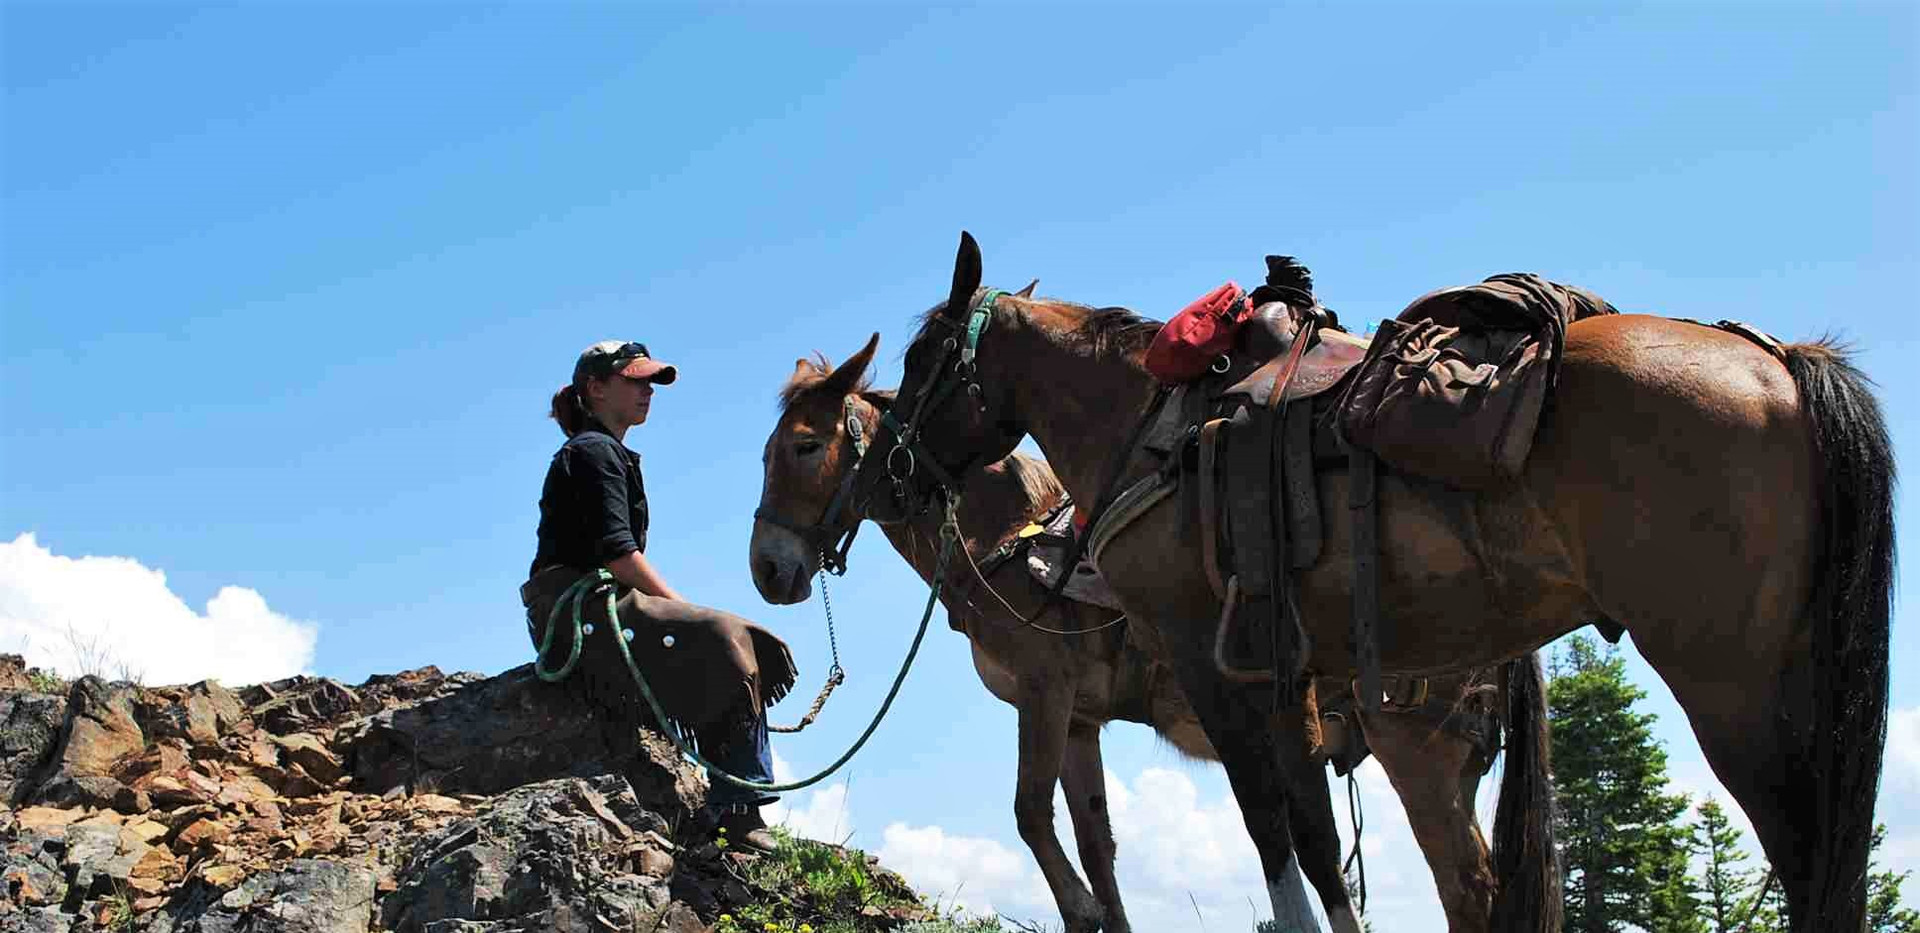 Wrangler on rock with mule & horse.jpg